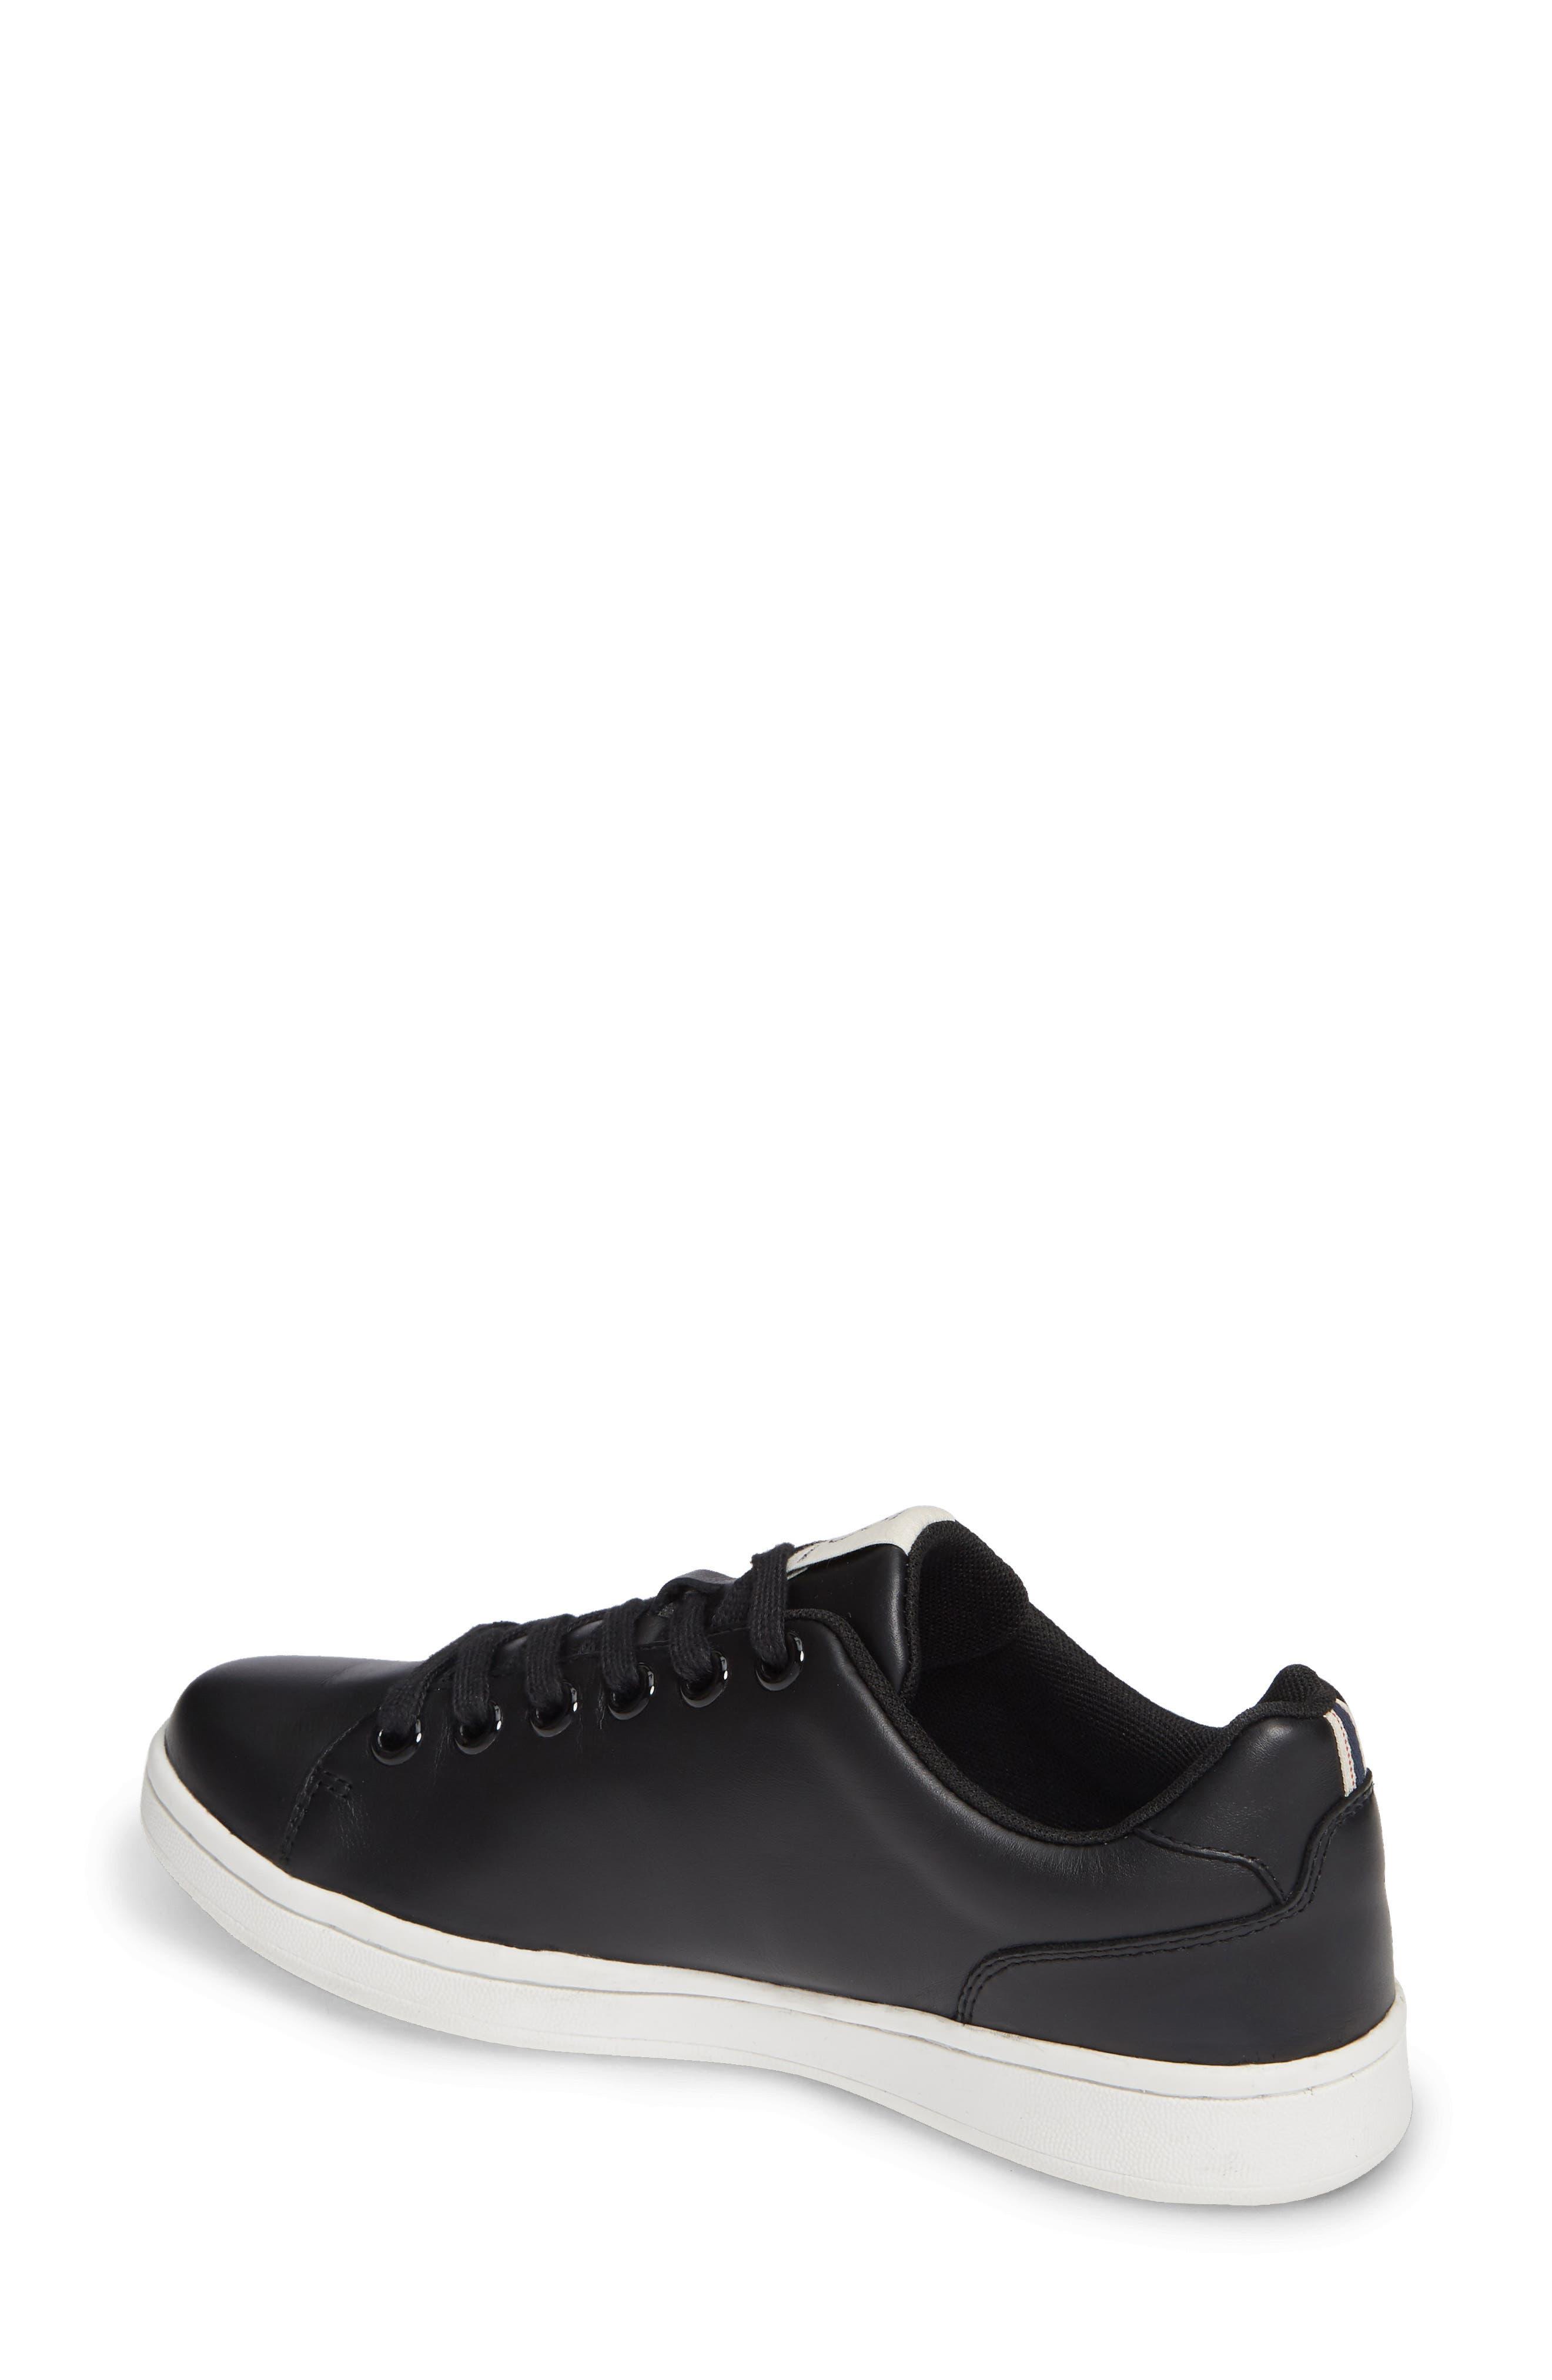 Chamour Sneaker,                             Alternate thumbnail 2, color,                             BLACK/ GOLD LEATHER